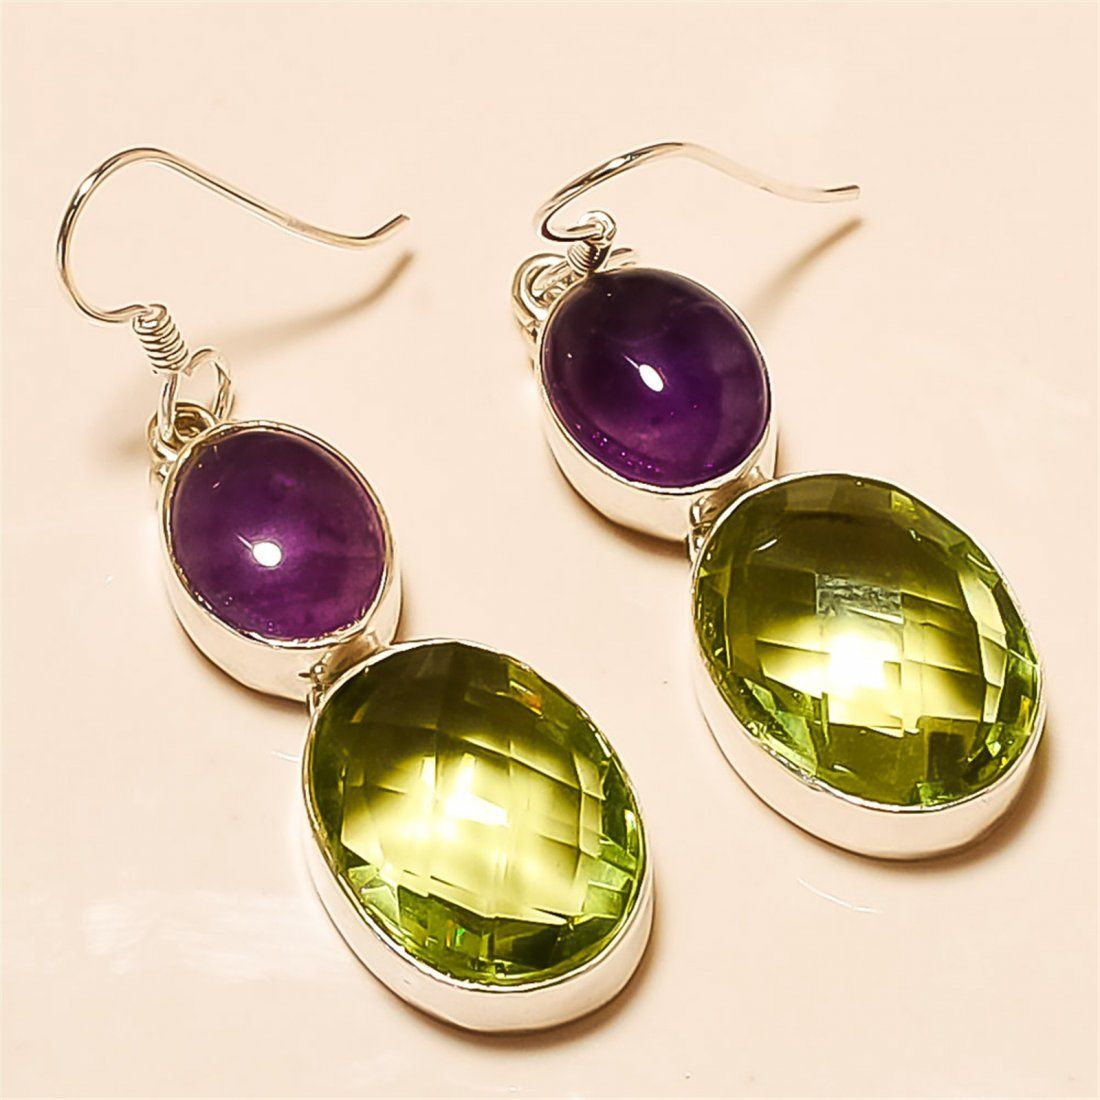 Green Amethyst/Amethyst Earring Solid Sterling Silver